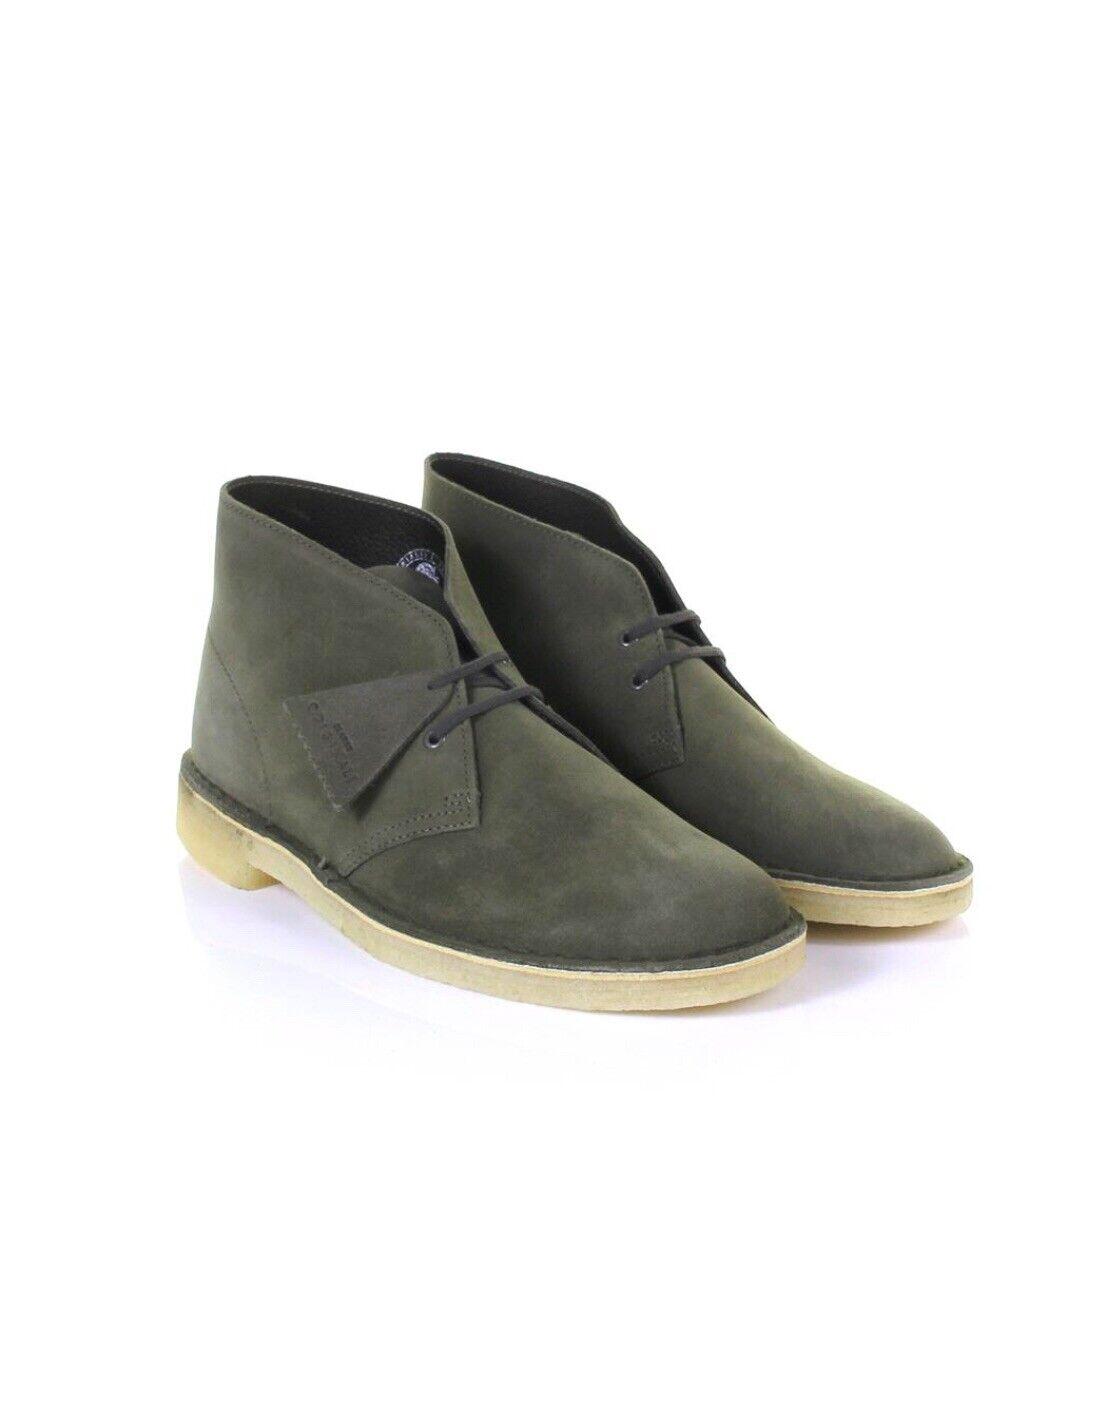 Clarks Originals Desert Boots Olive Suede Men's Sizes. 26138234